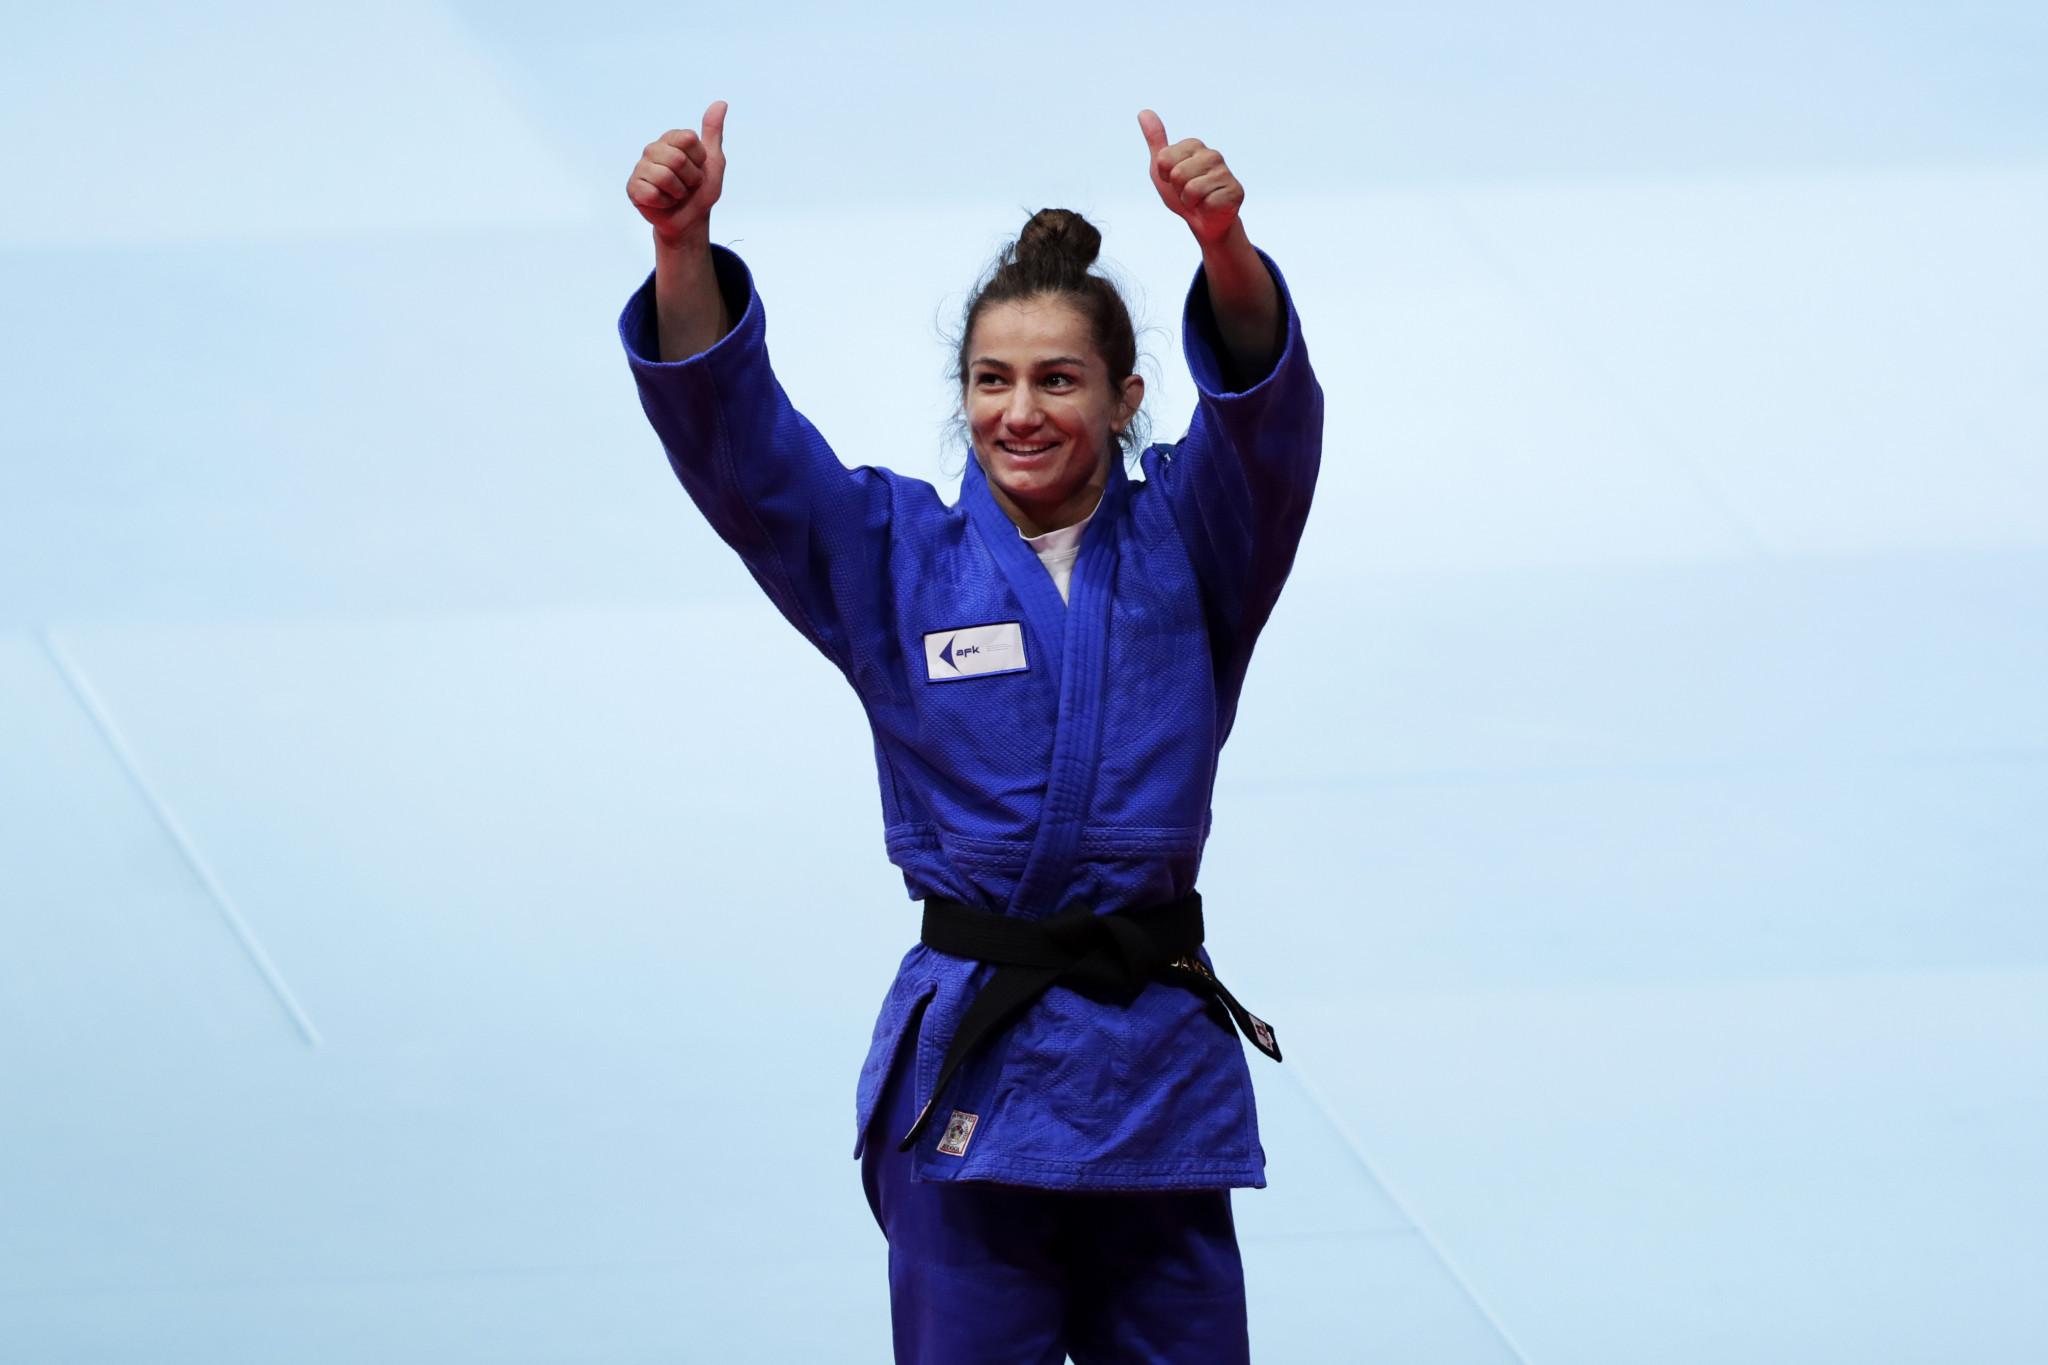 Kosovan judo star Kelmendi welcomes postponement of Tokyo 2020 amid injury concern